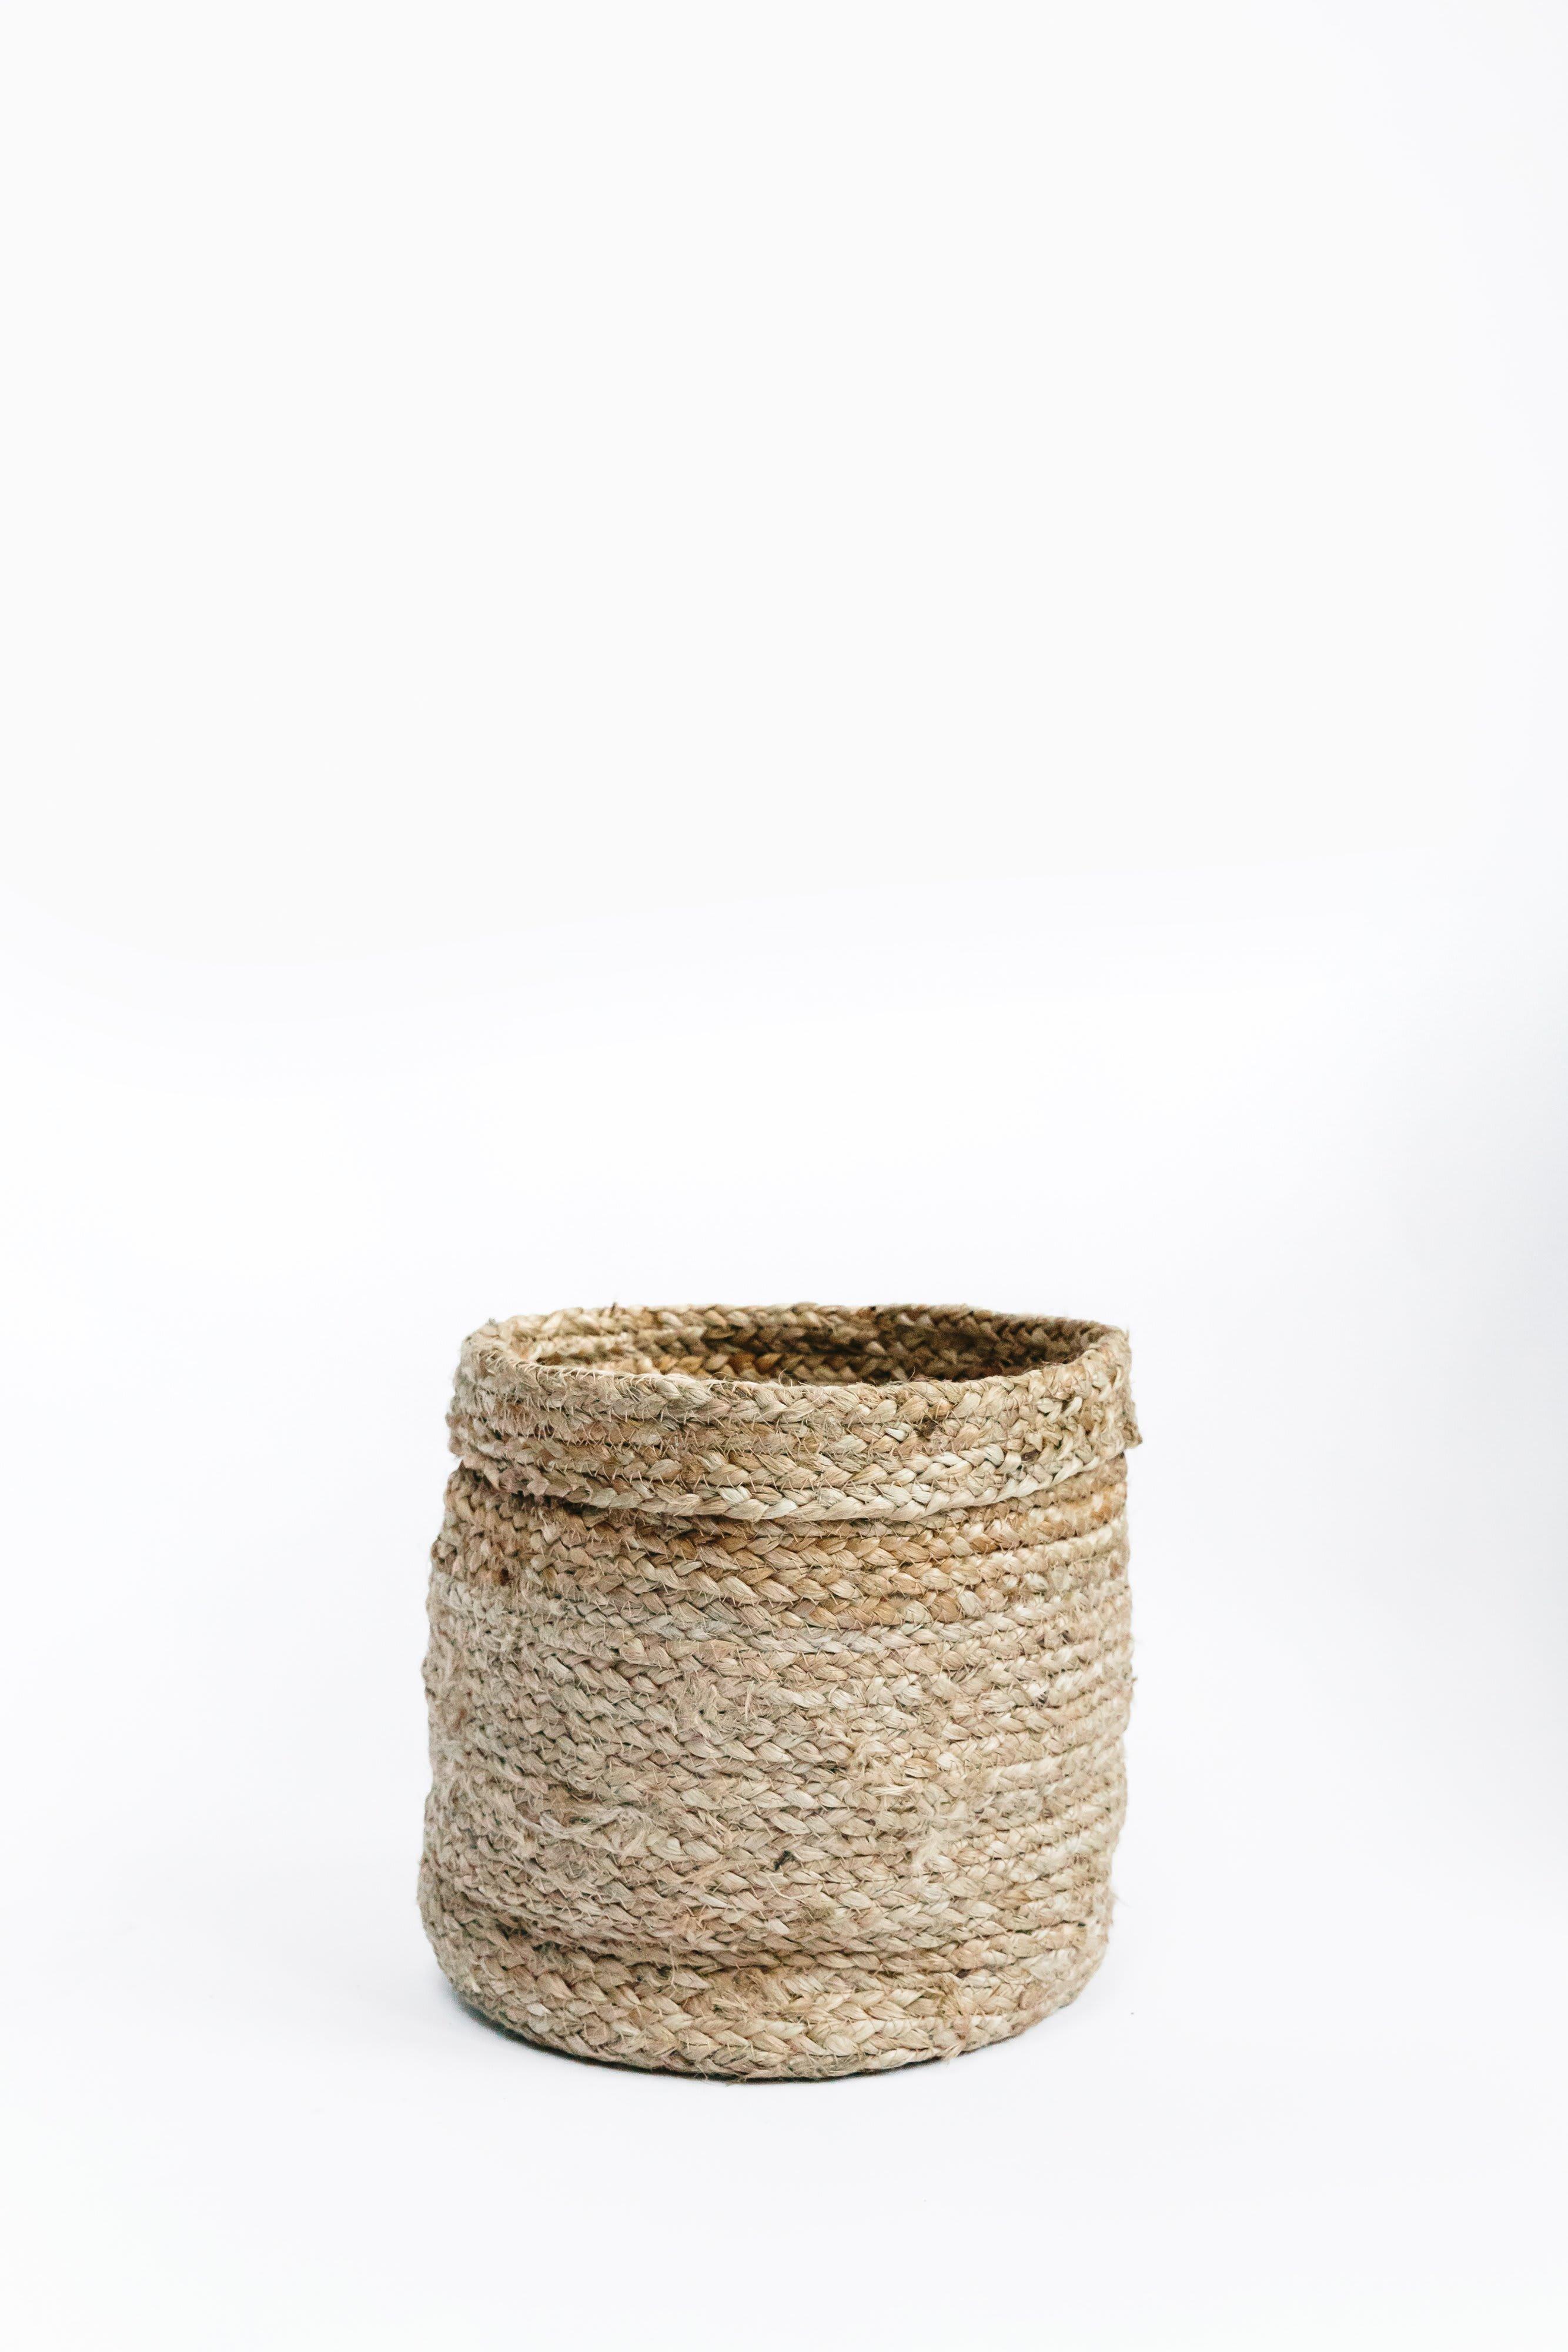 Urban Nature Culture Braided Natural Jute Basket